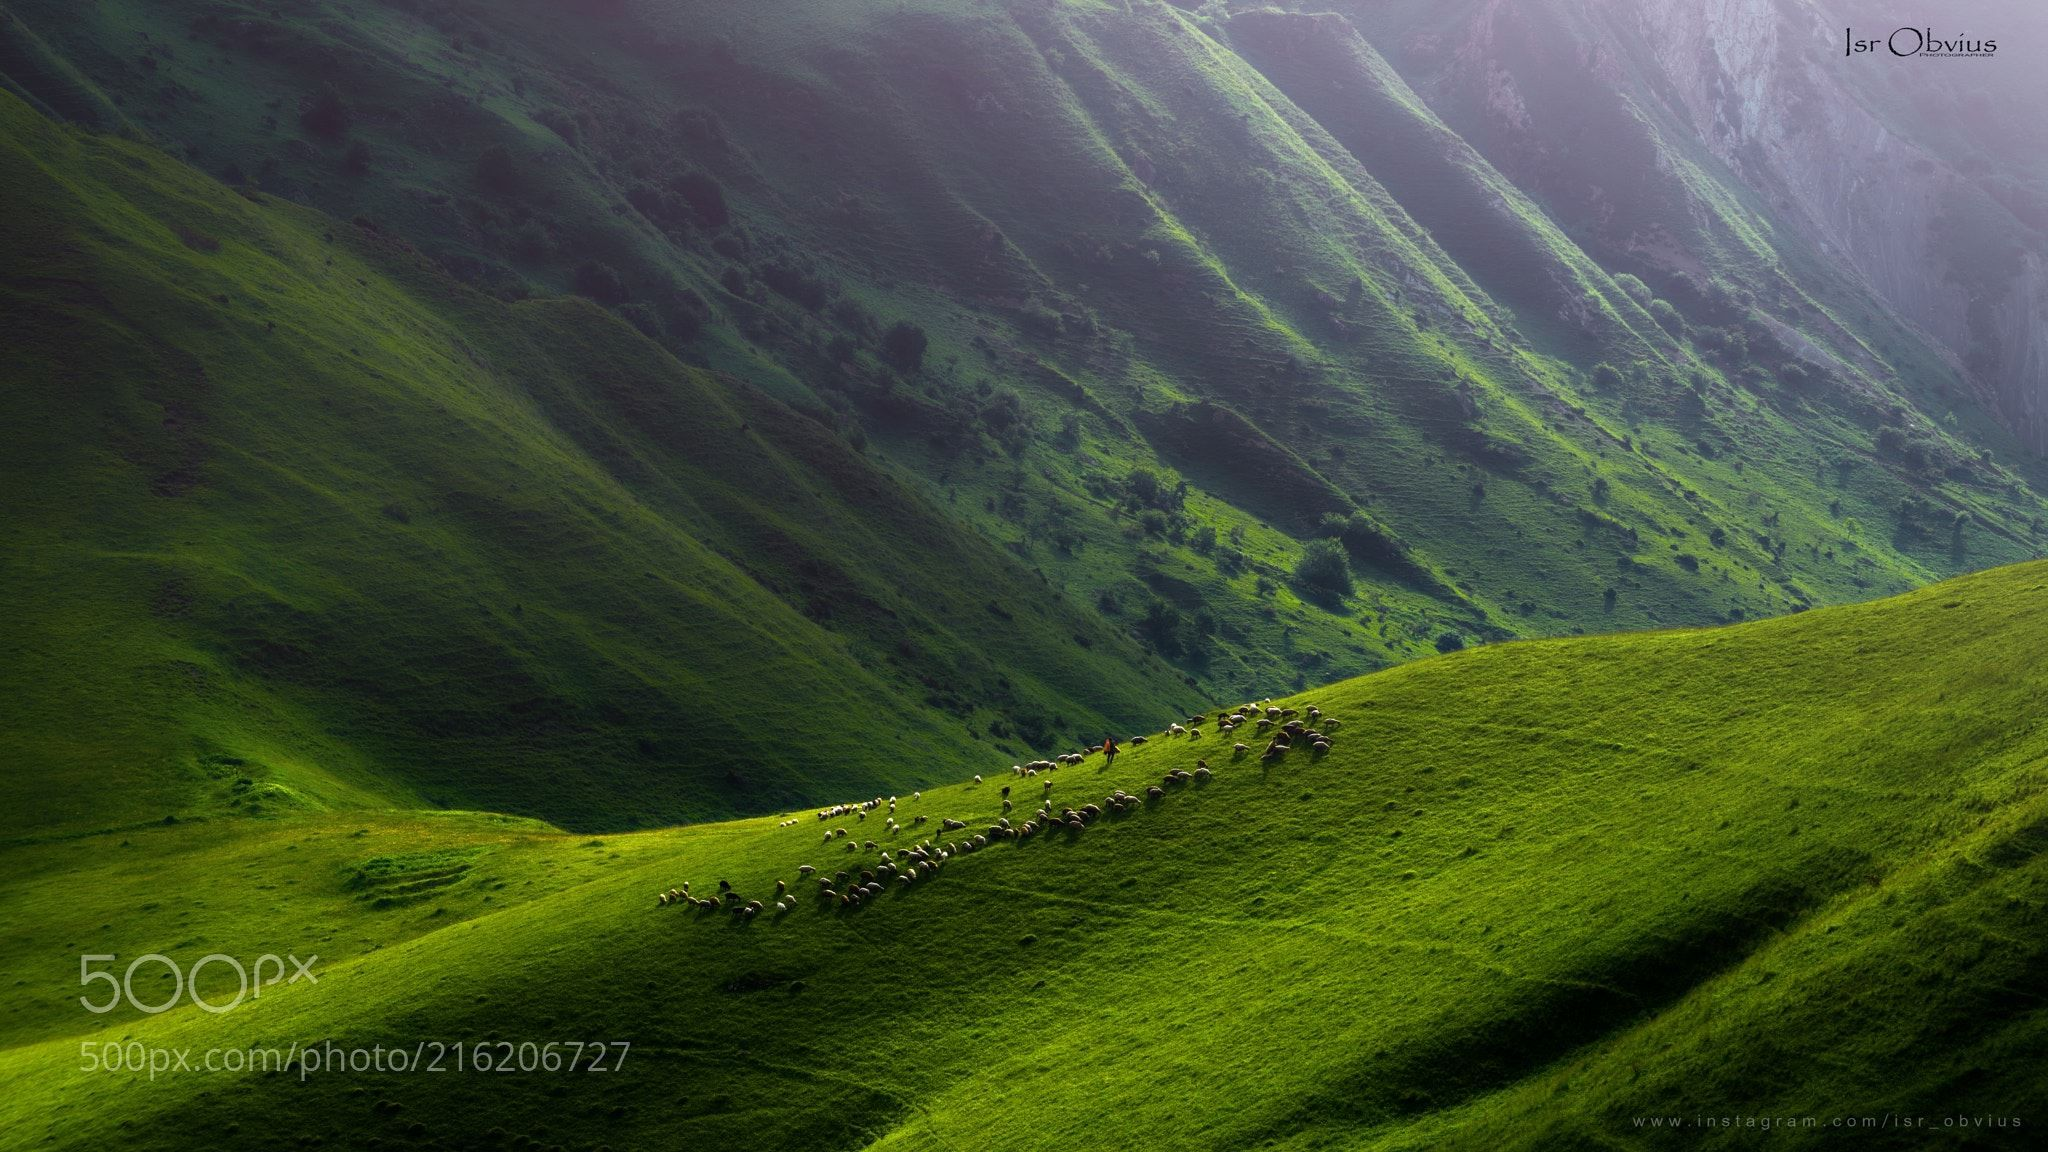 Grassland (İsr Obvius - Rəşad İsgəndəroğlu / Baku / Azerbaijan) #NIKON D810 #landscape #photo #nature